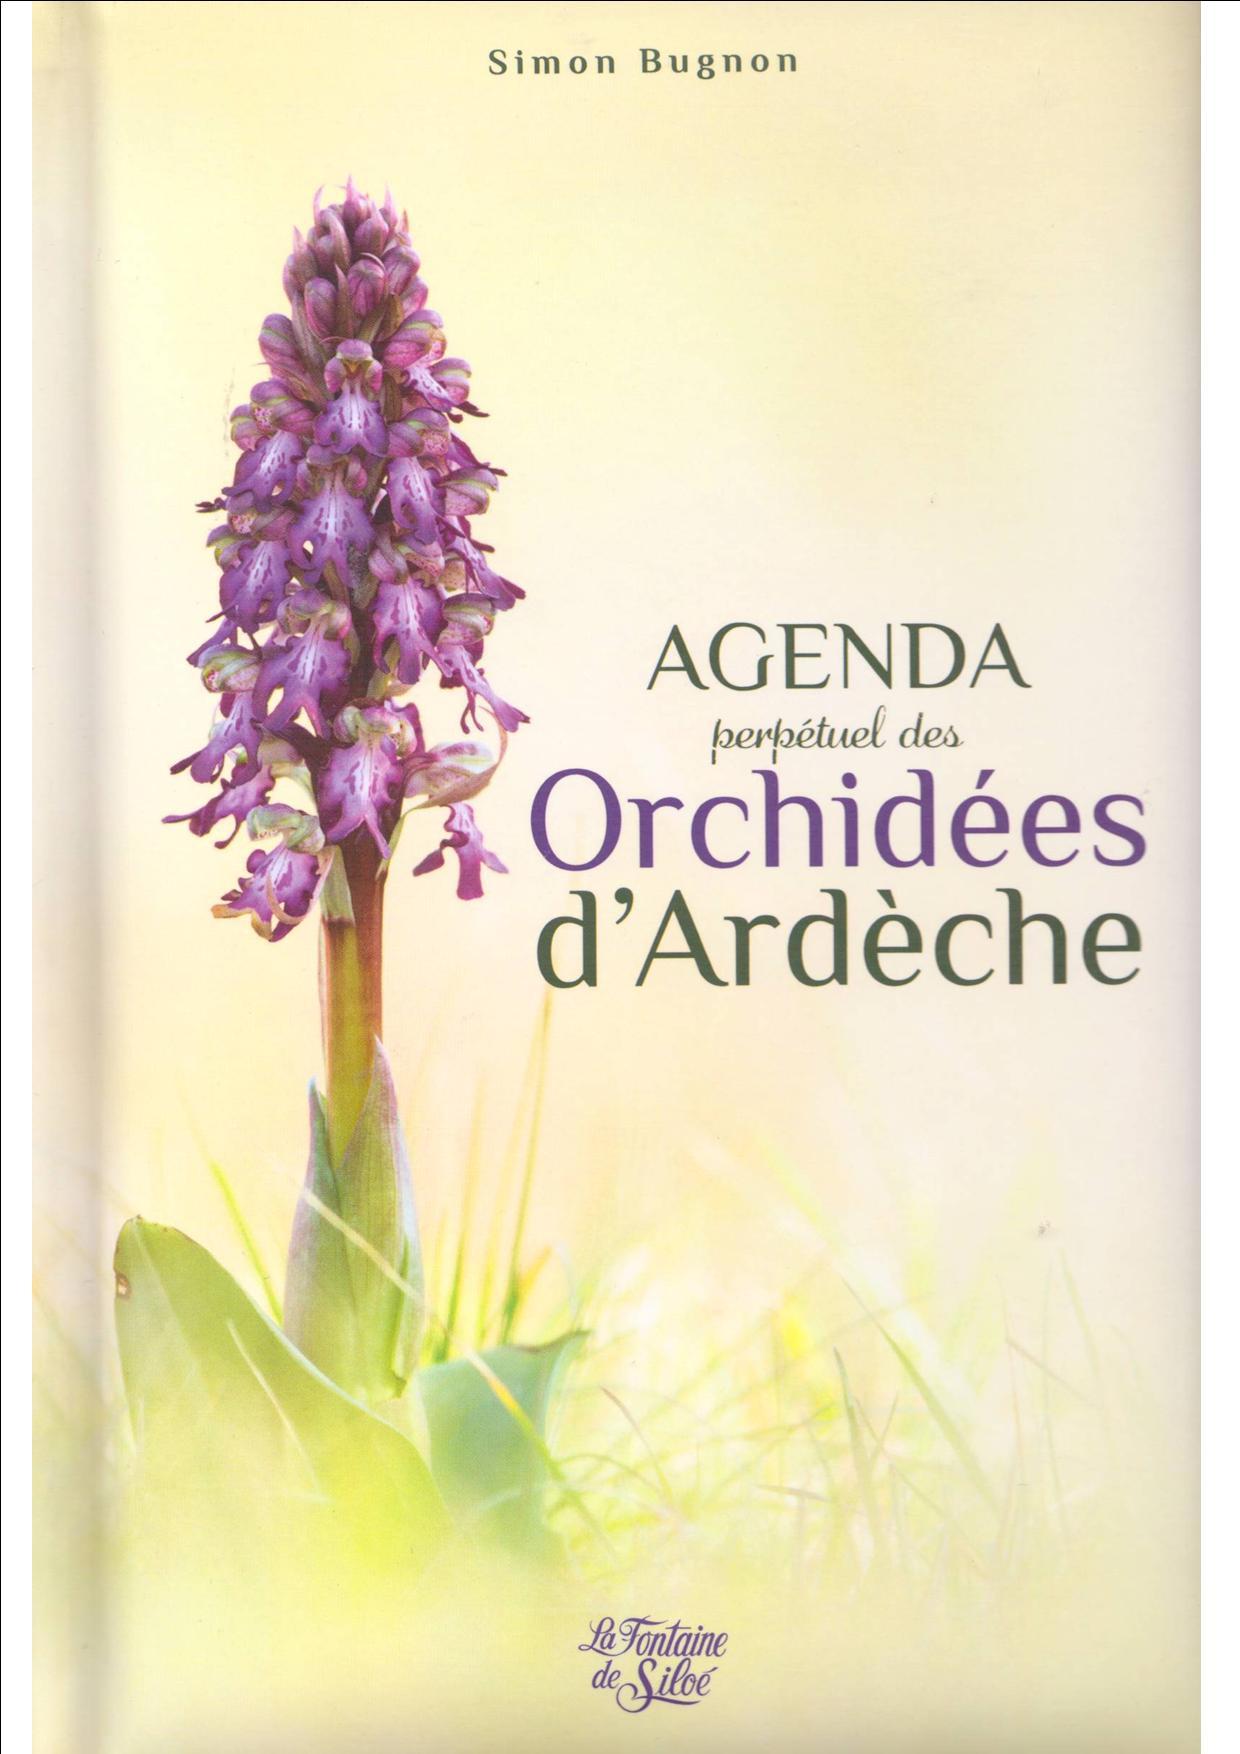 Bugnon orchidees